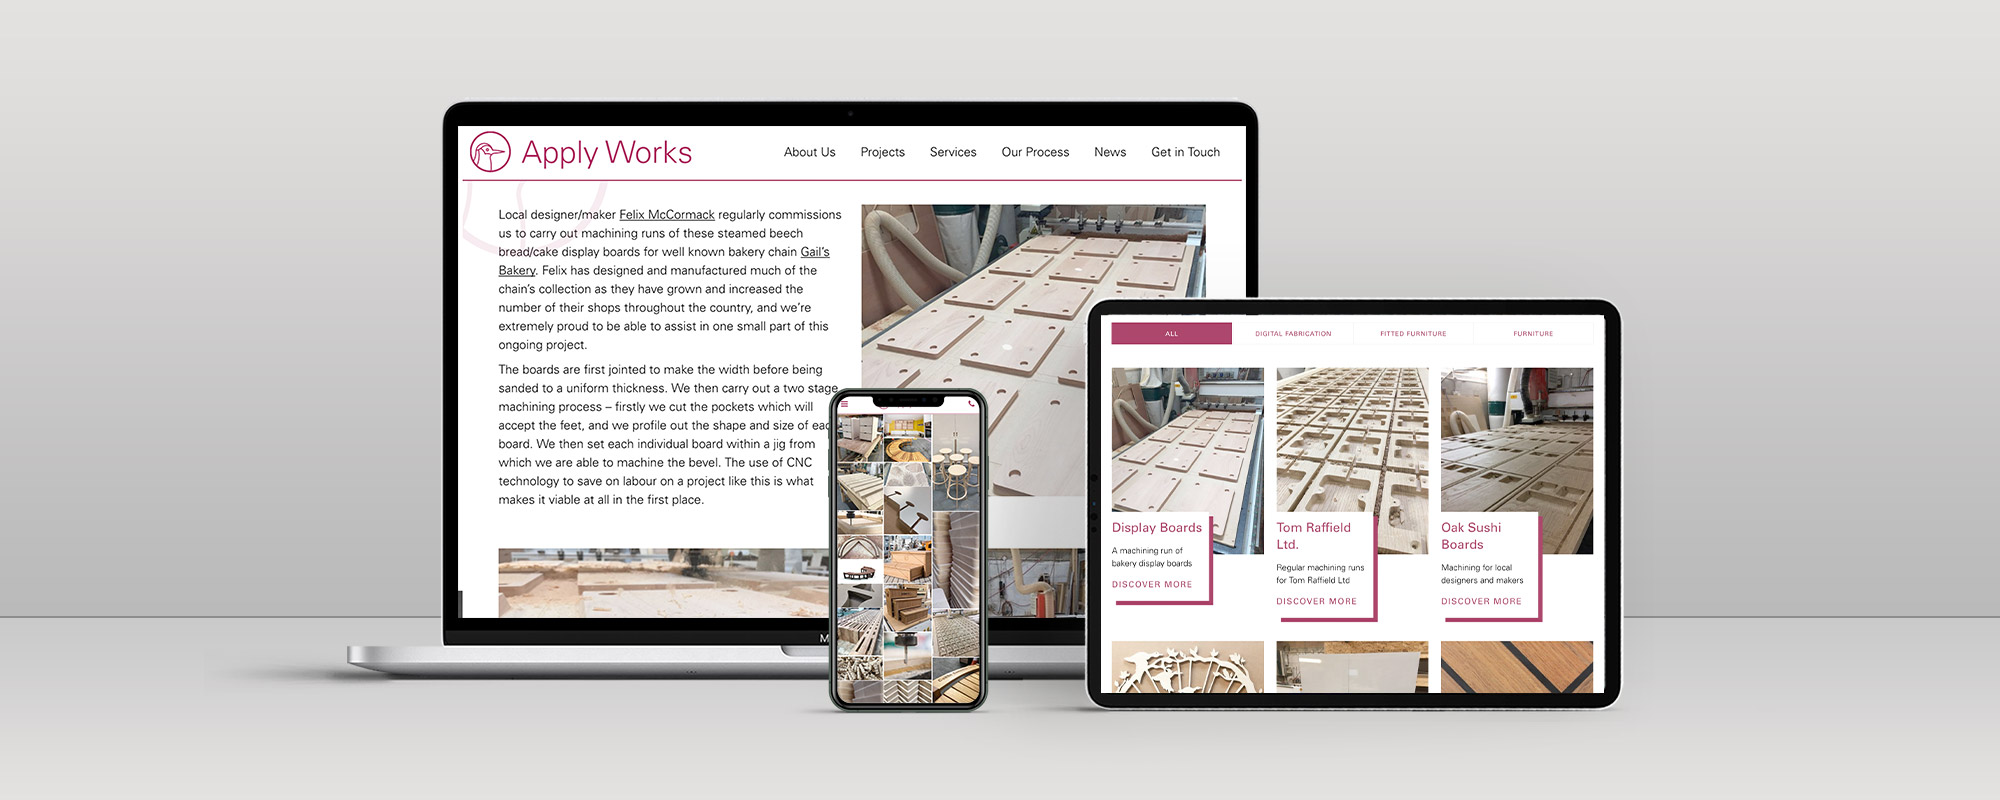 Apply Works Wordpress Website Design on 3 Devices